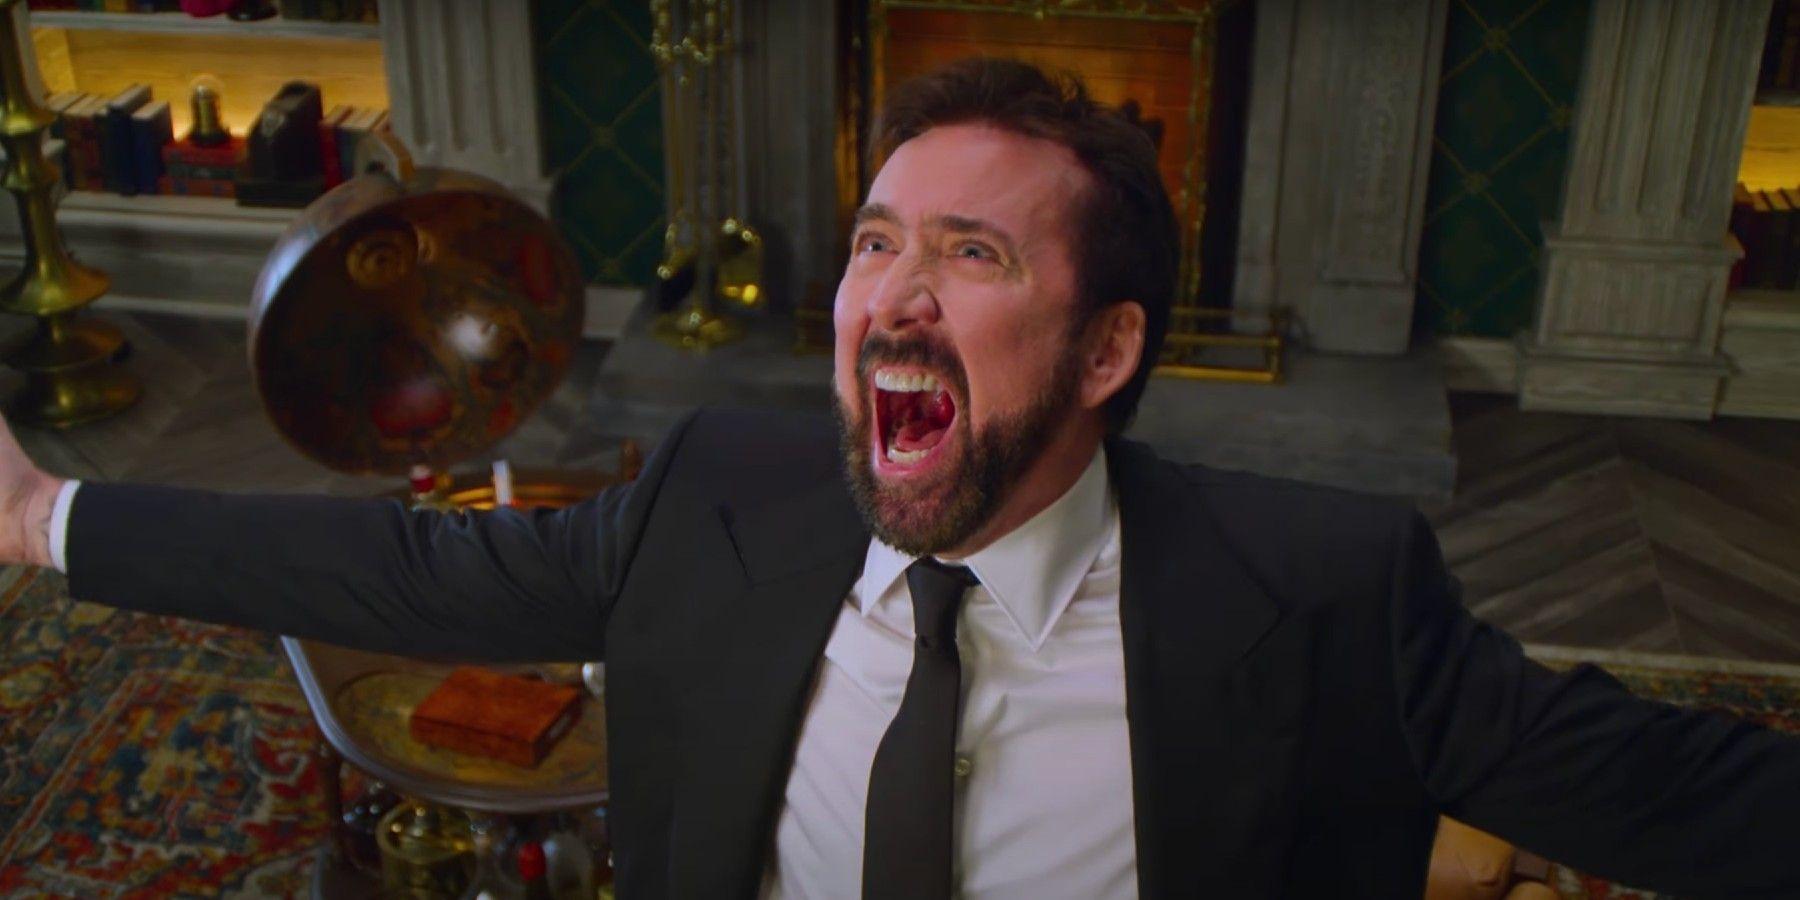 History of Swear Words Trailer: Nicolas Cage Recreates Iconic Deadfall Meltdown